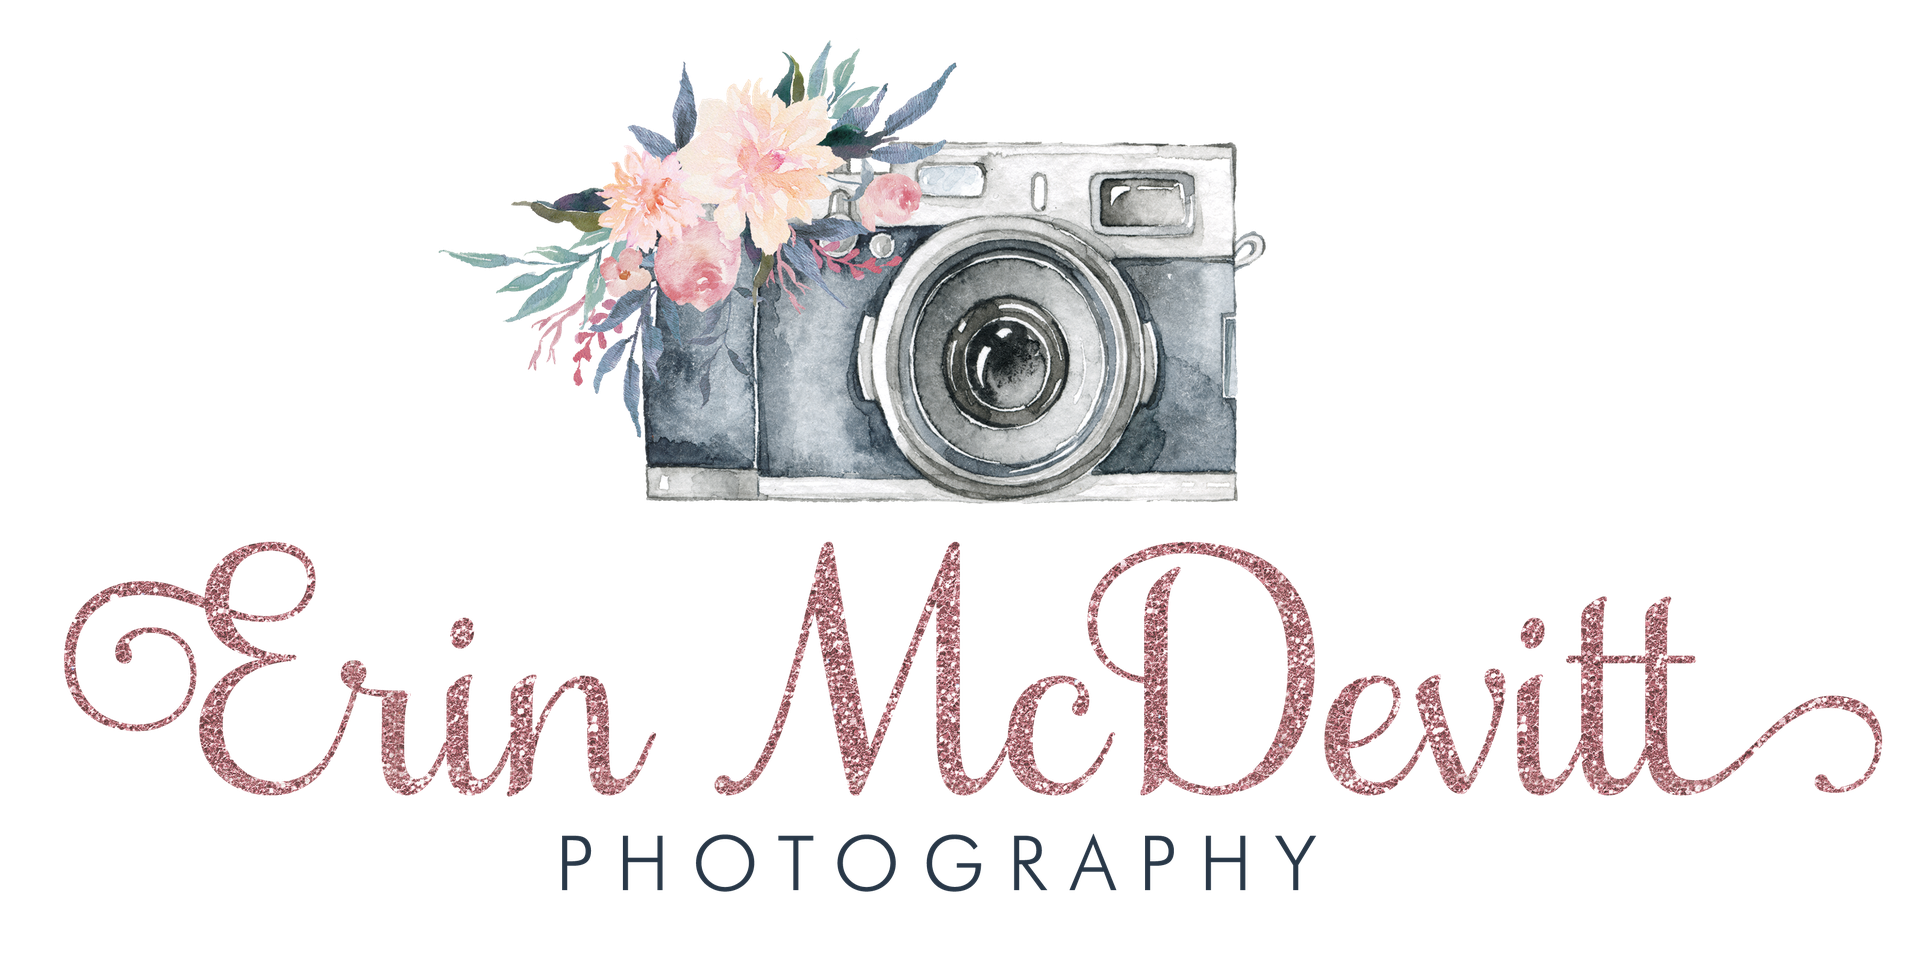 Erin McDervitt Photography